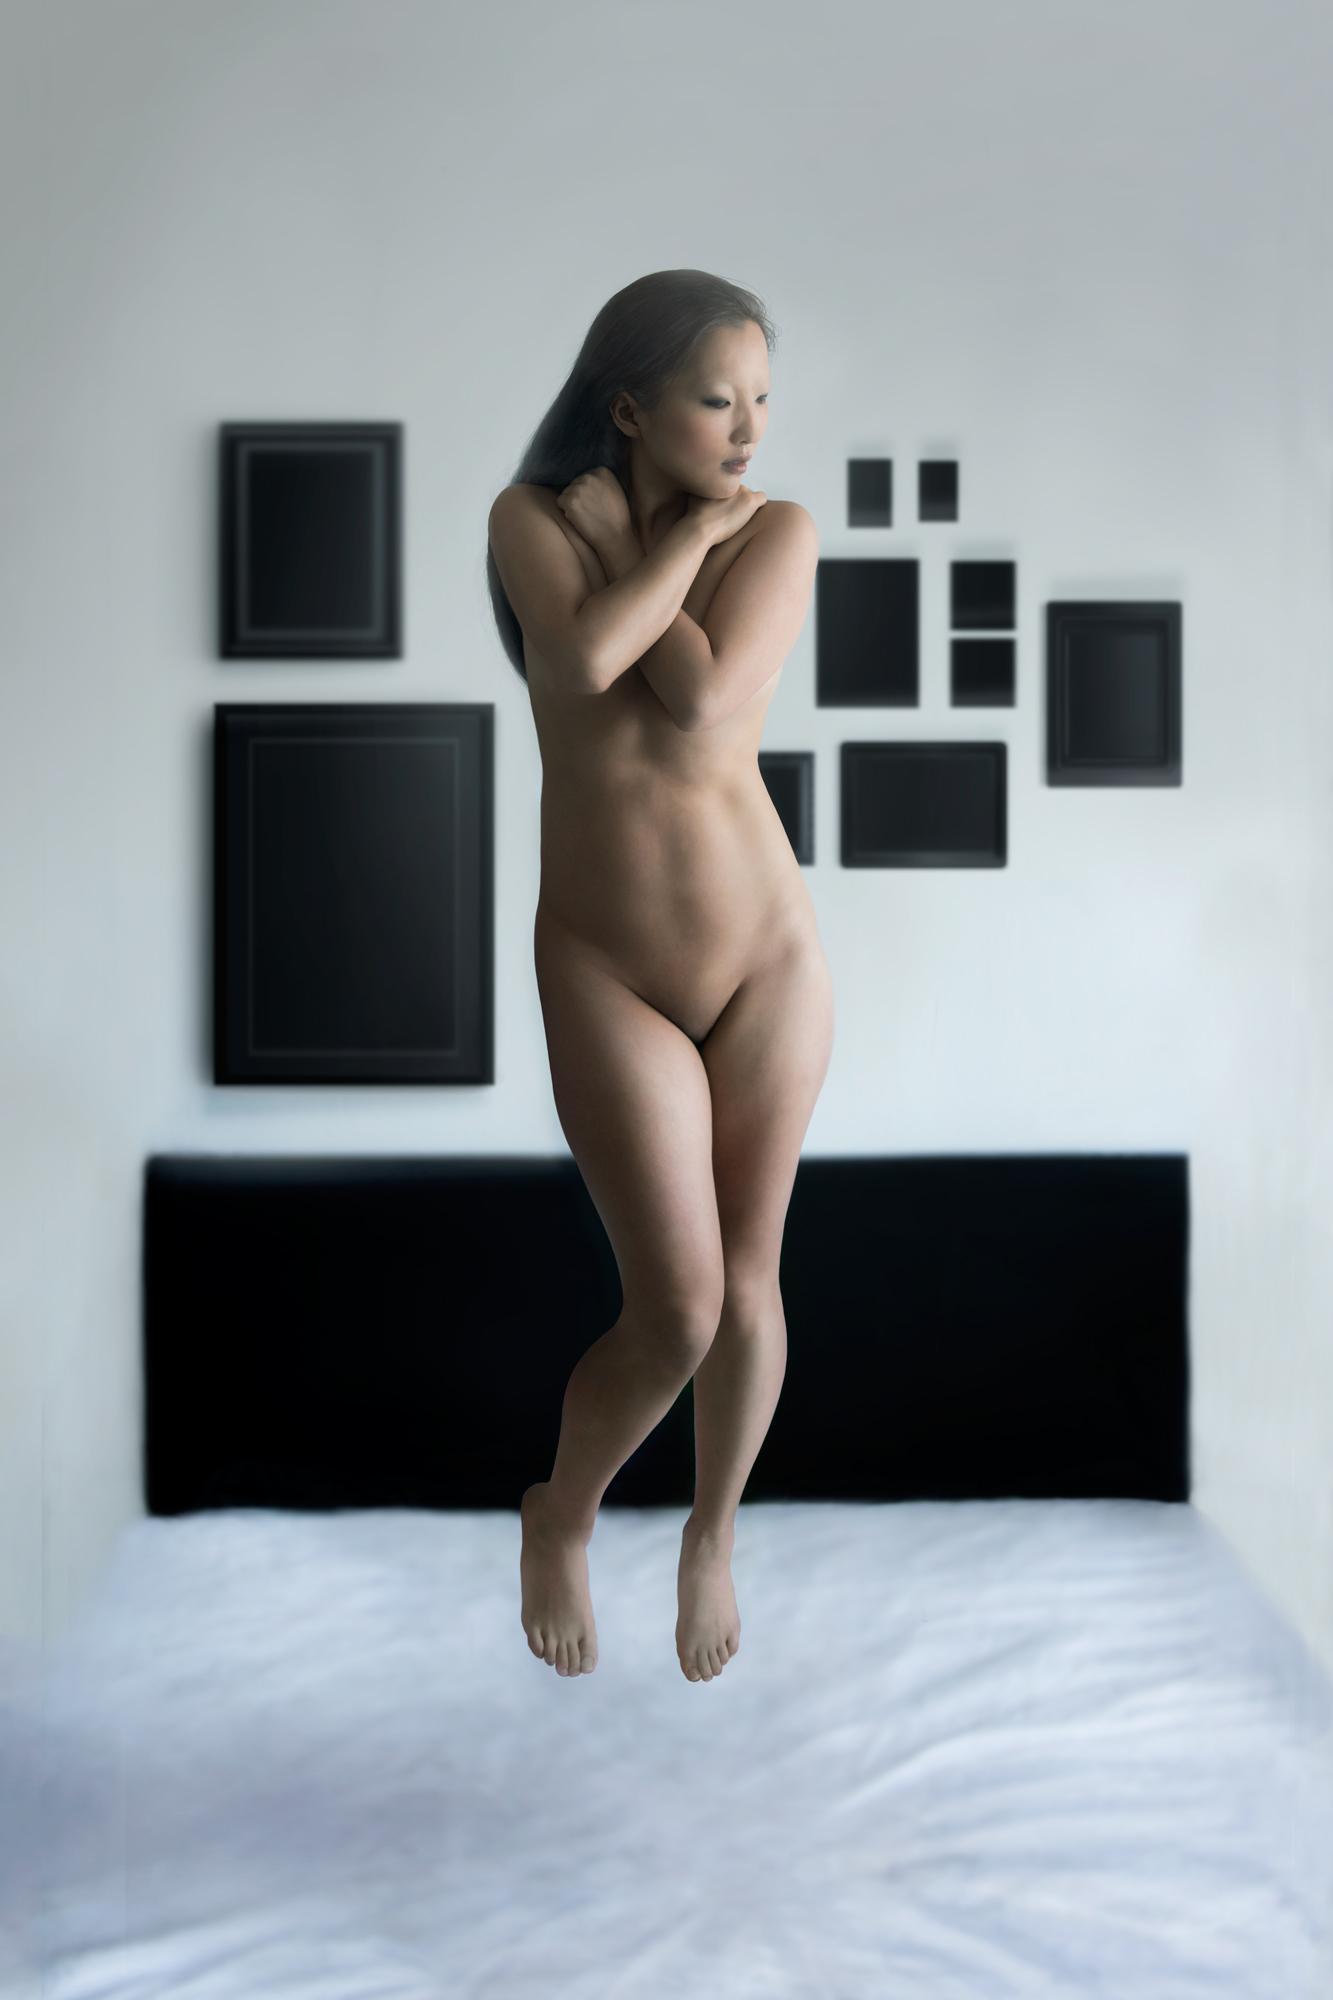 "[REVE]<br>Model : <u><a href=""https://www.facebook.com/Lady-Heroine-549930911771100/"">Lady Heroïne</a></u><br><u><a href=""http://www.nihil.fr/product/reve/"">Order a print</a></u>"